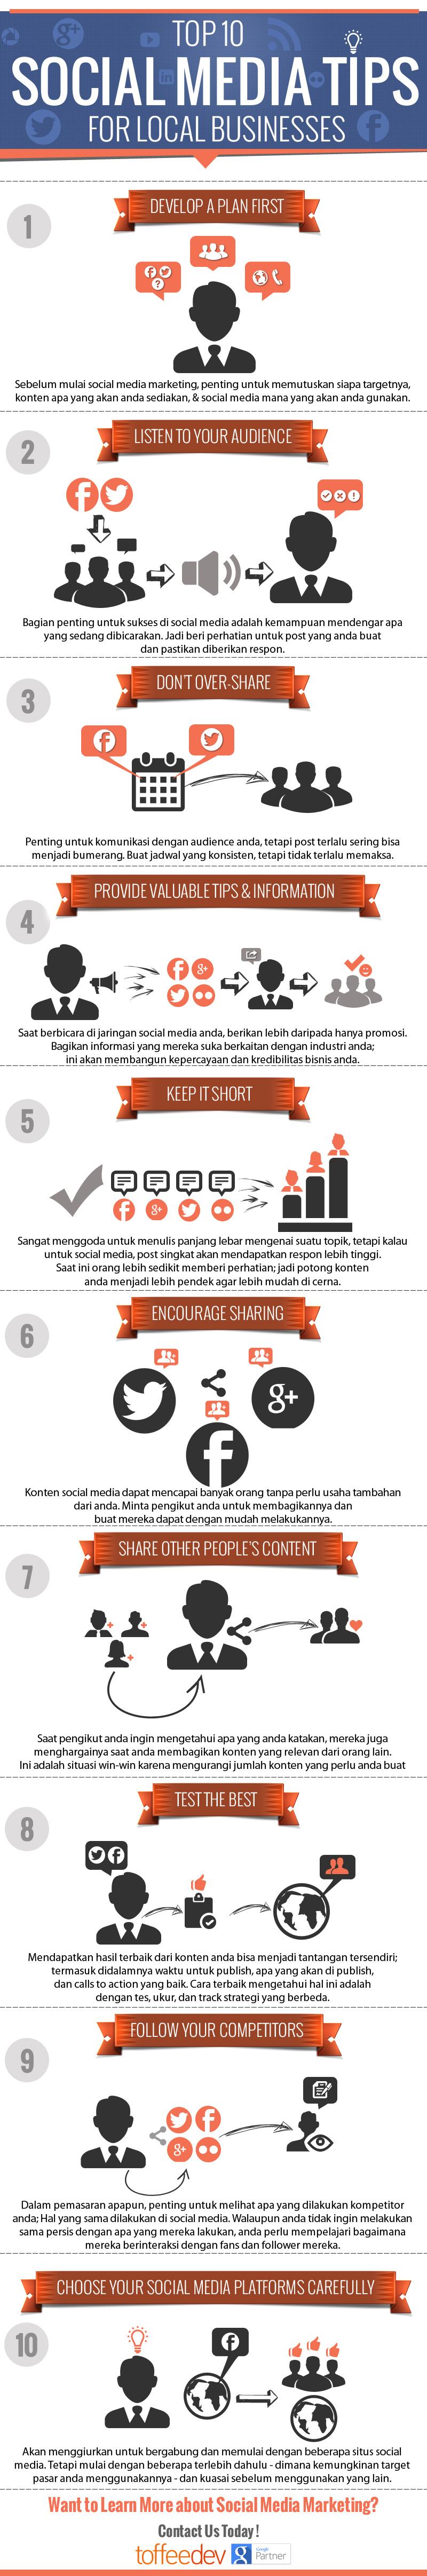 top-10-social-media